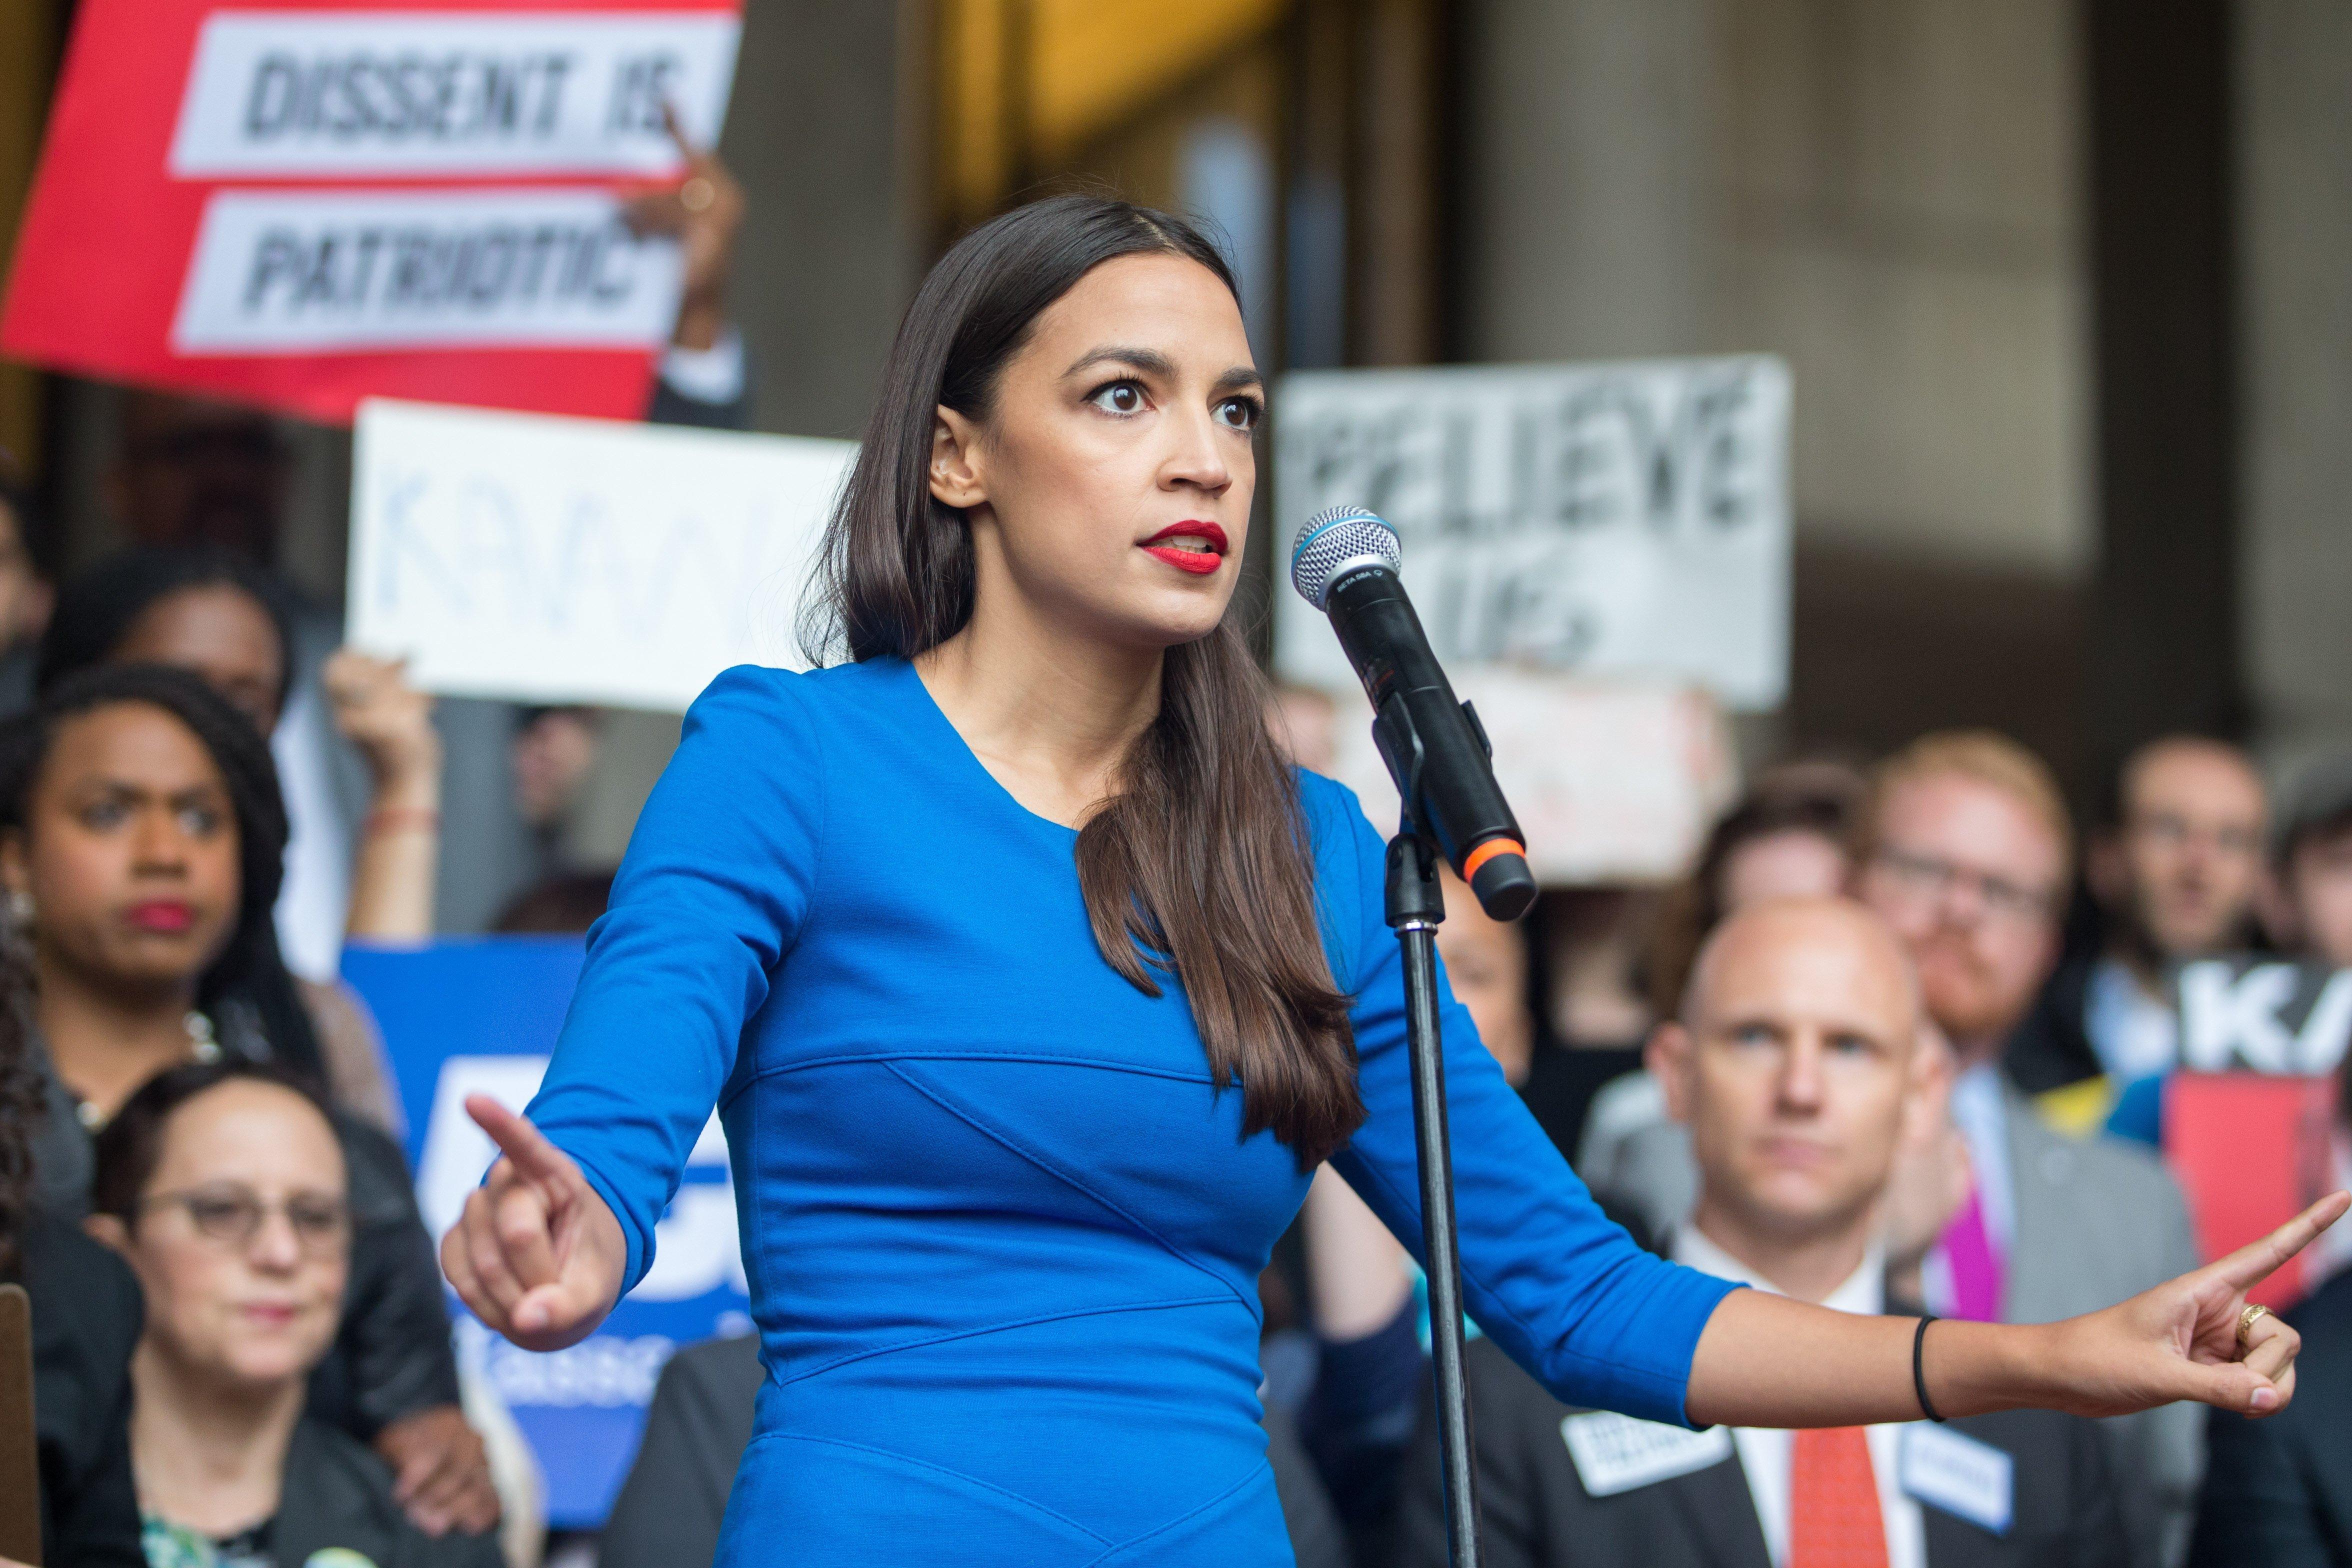 Alexandria Ocasio-Cortez giving a campaign speech | Photo: Getty Images